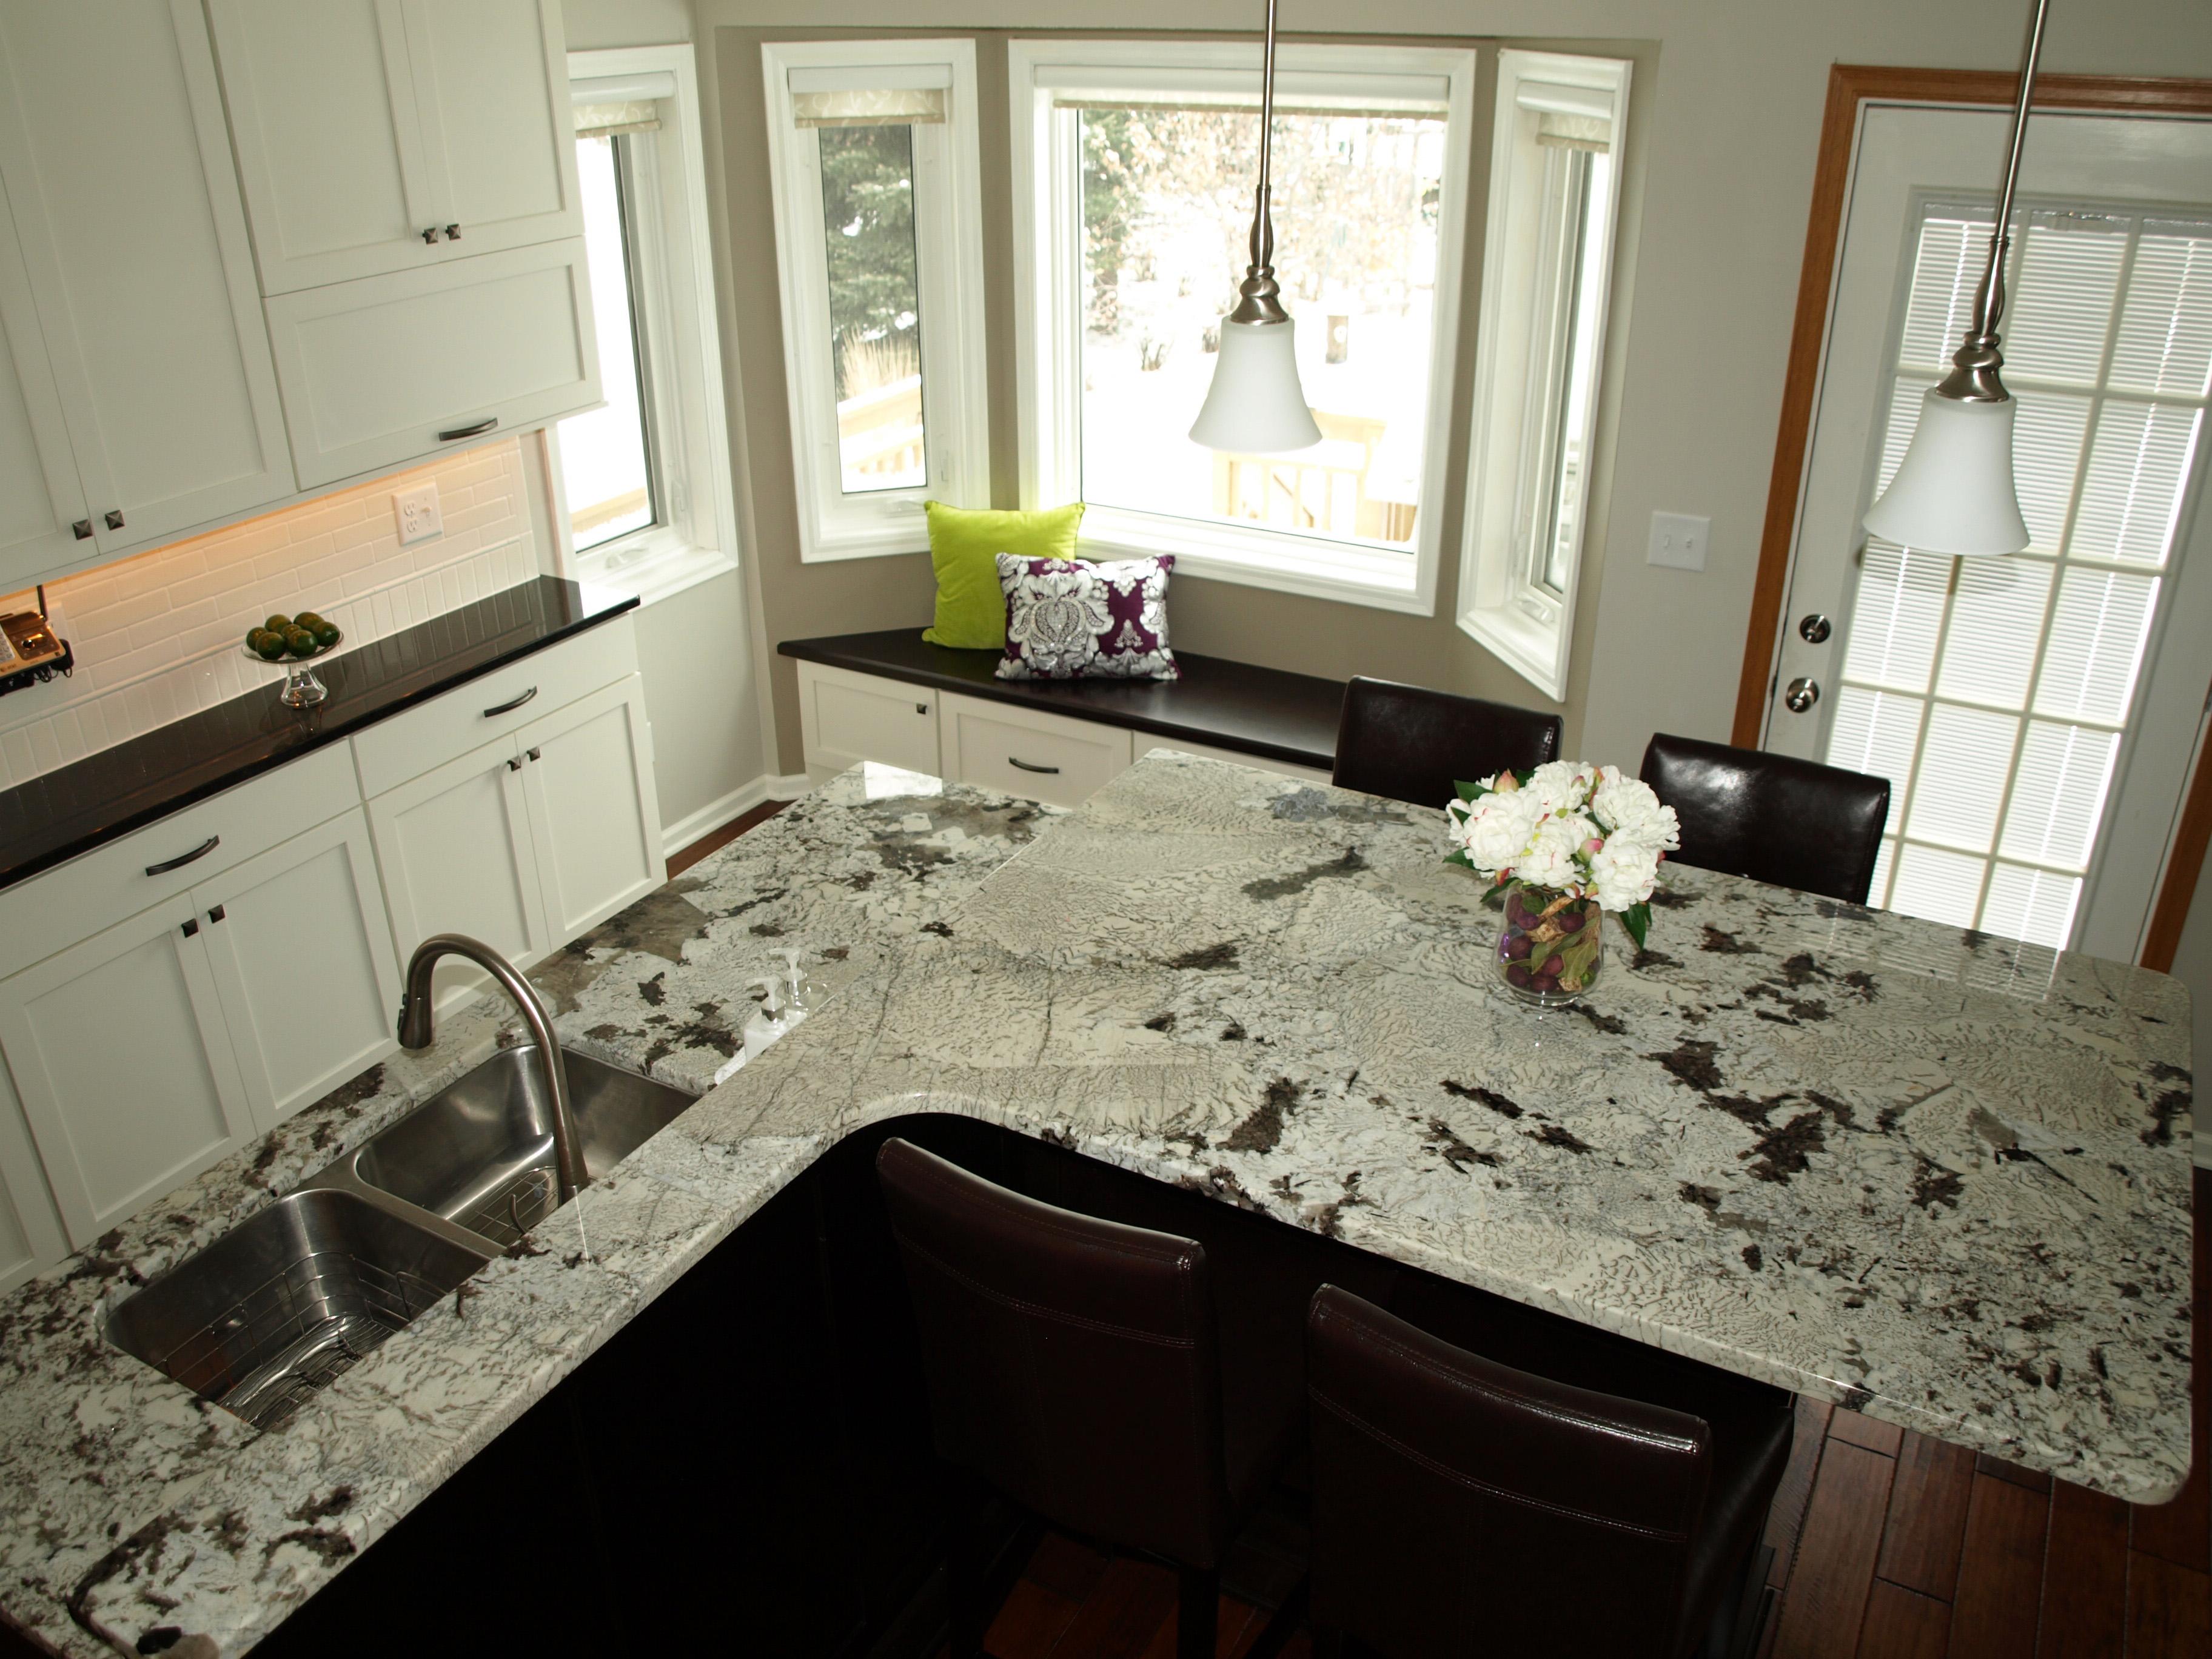 Ohana Construction Inc Receives Prestigious Angies List Super - Angie's list bathroom remodeling